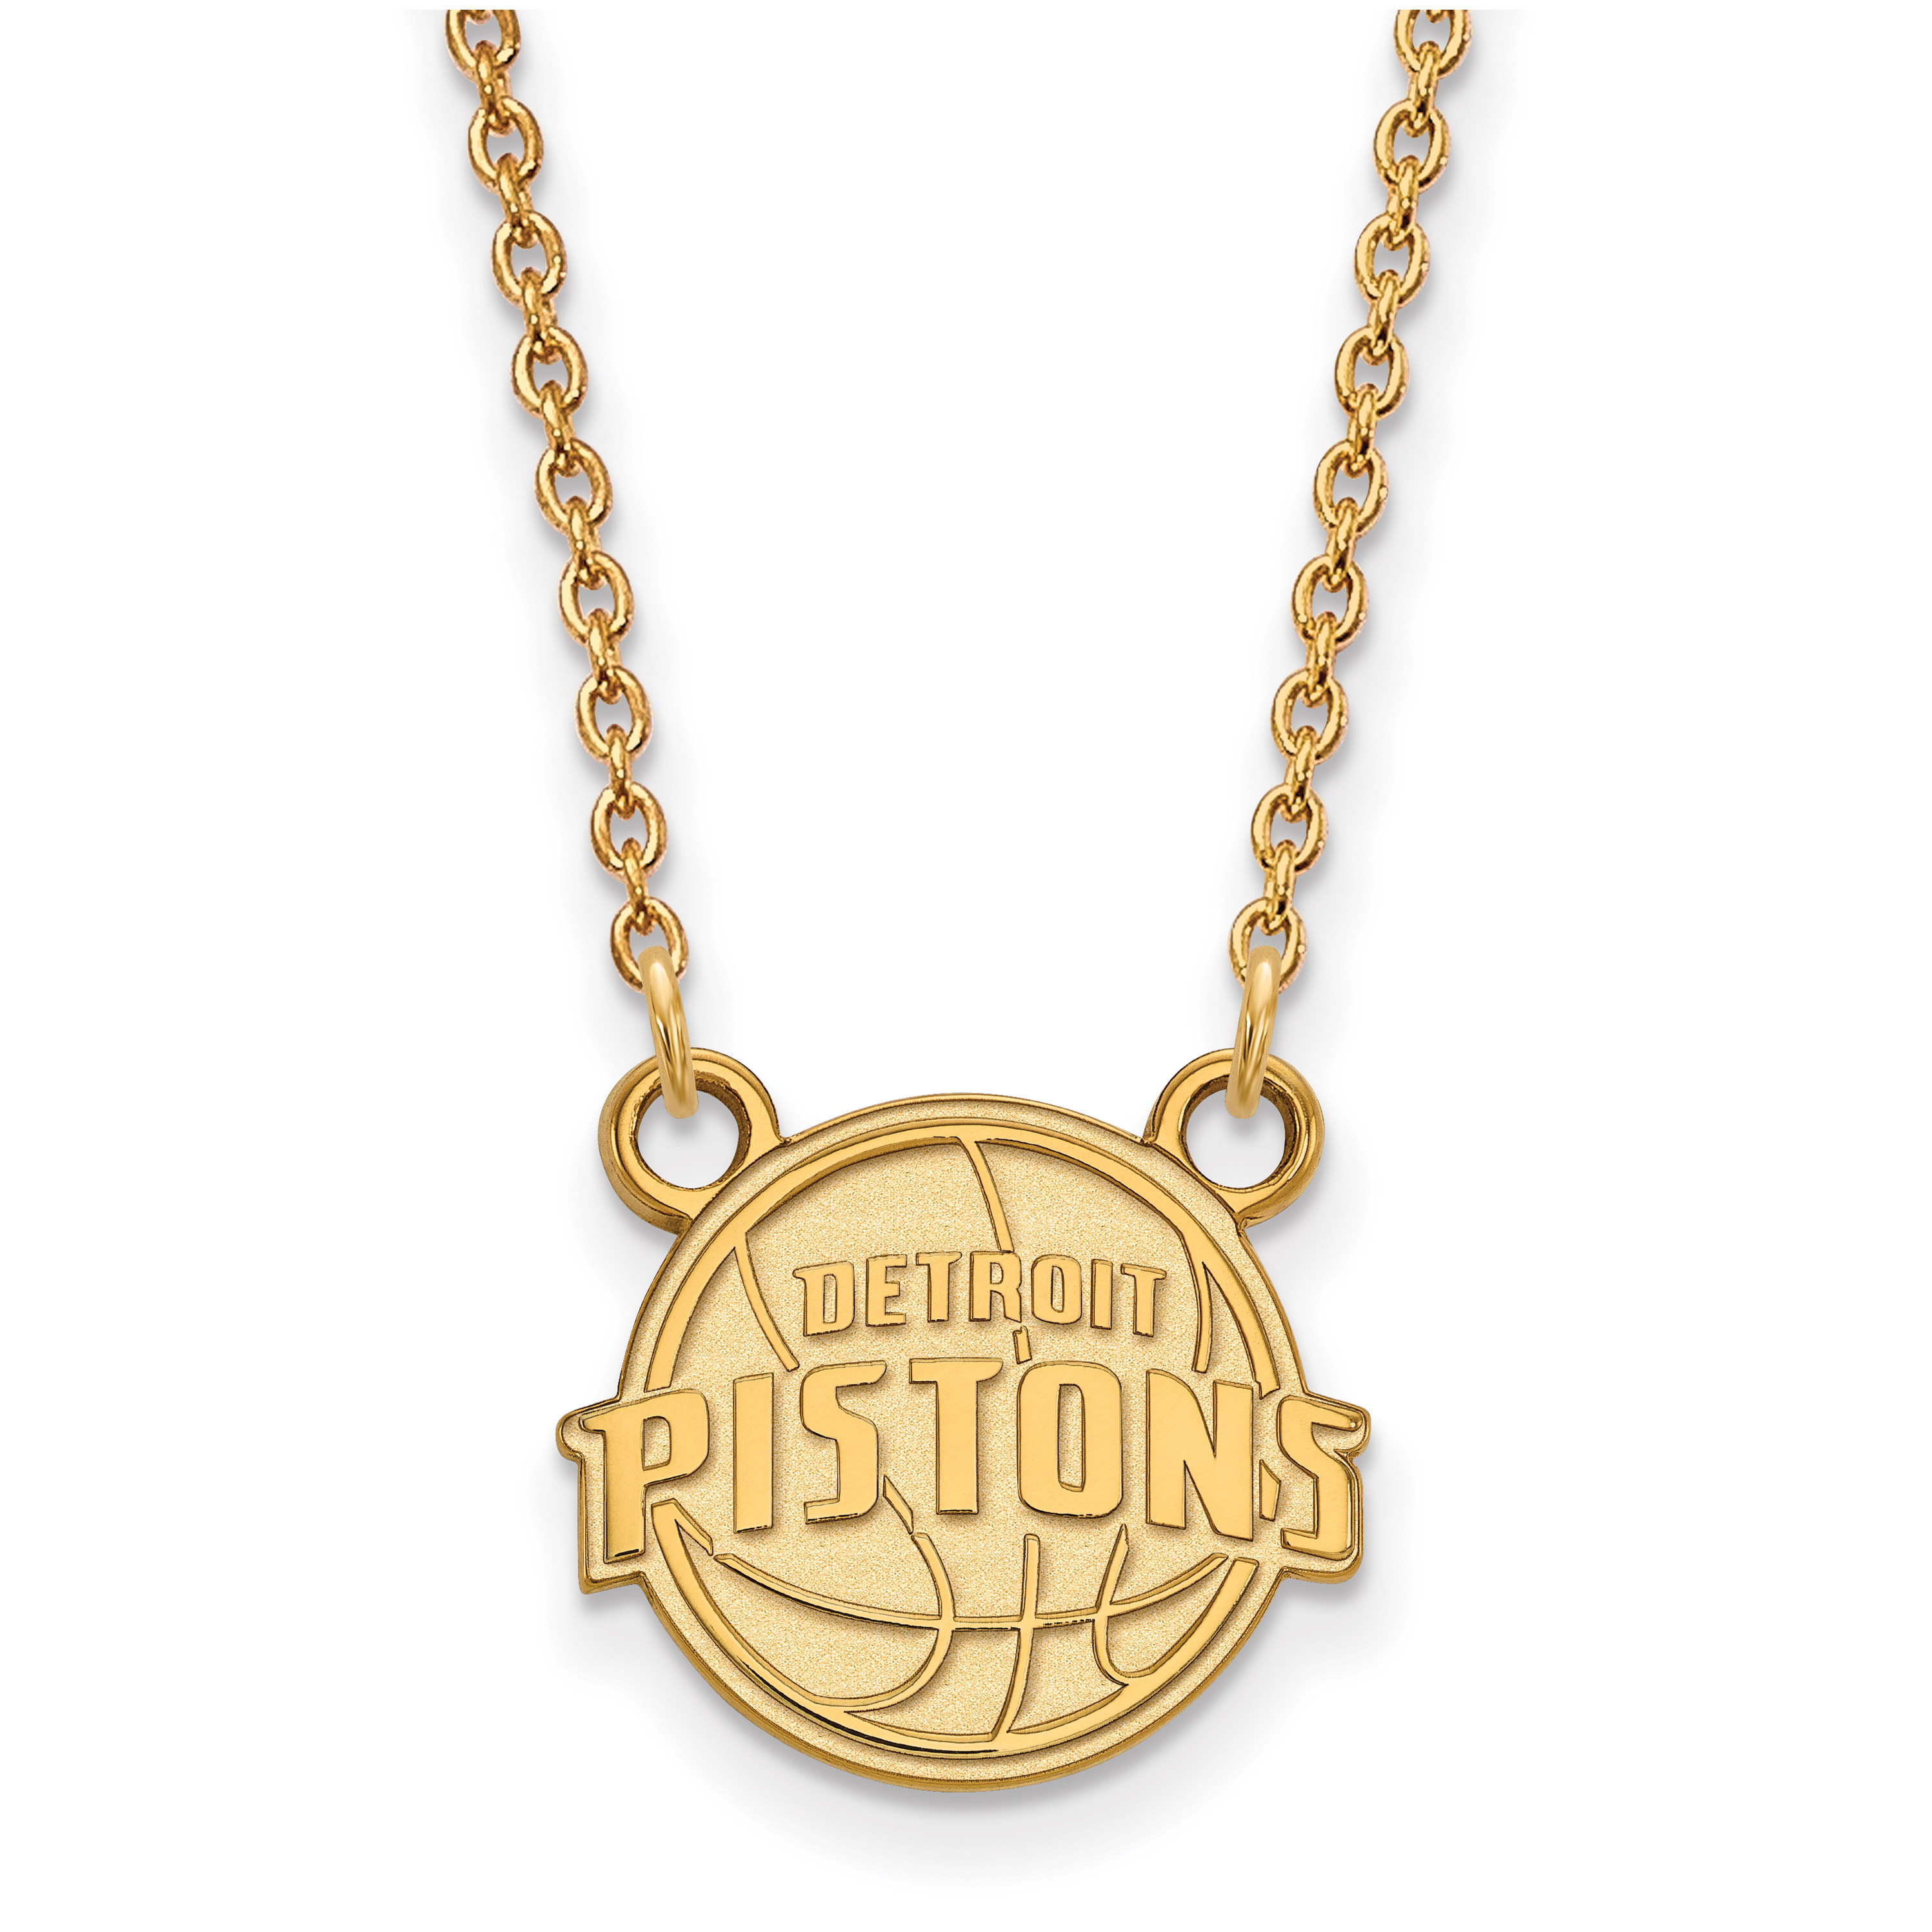 Detroit Pistons Women's Gold Plated Pendant Necklace - No Size